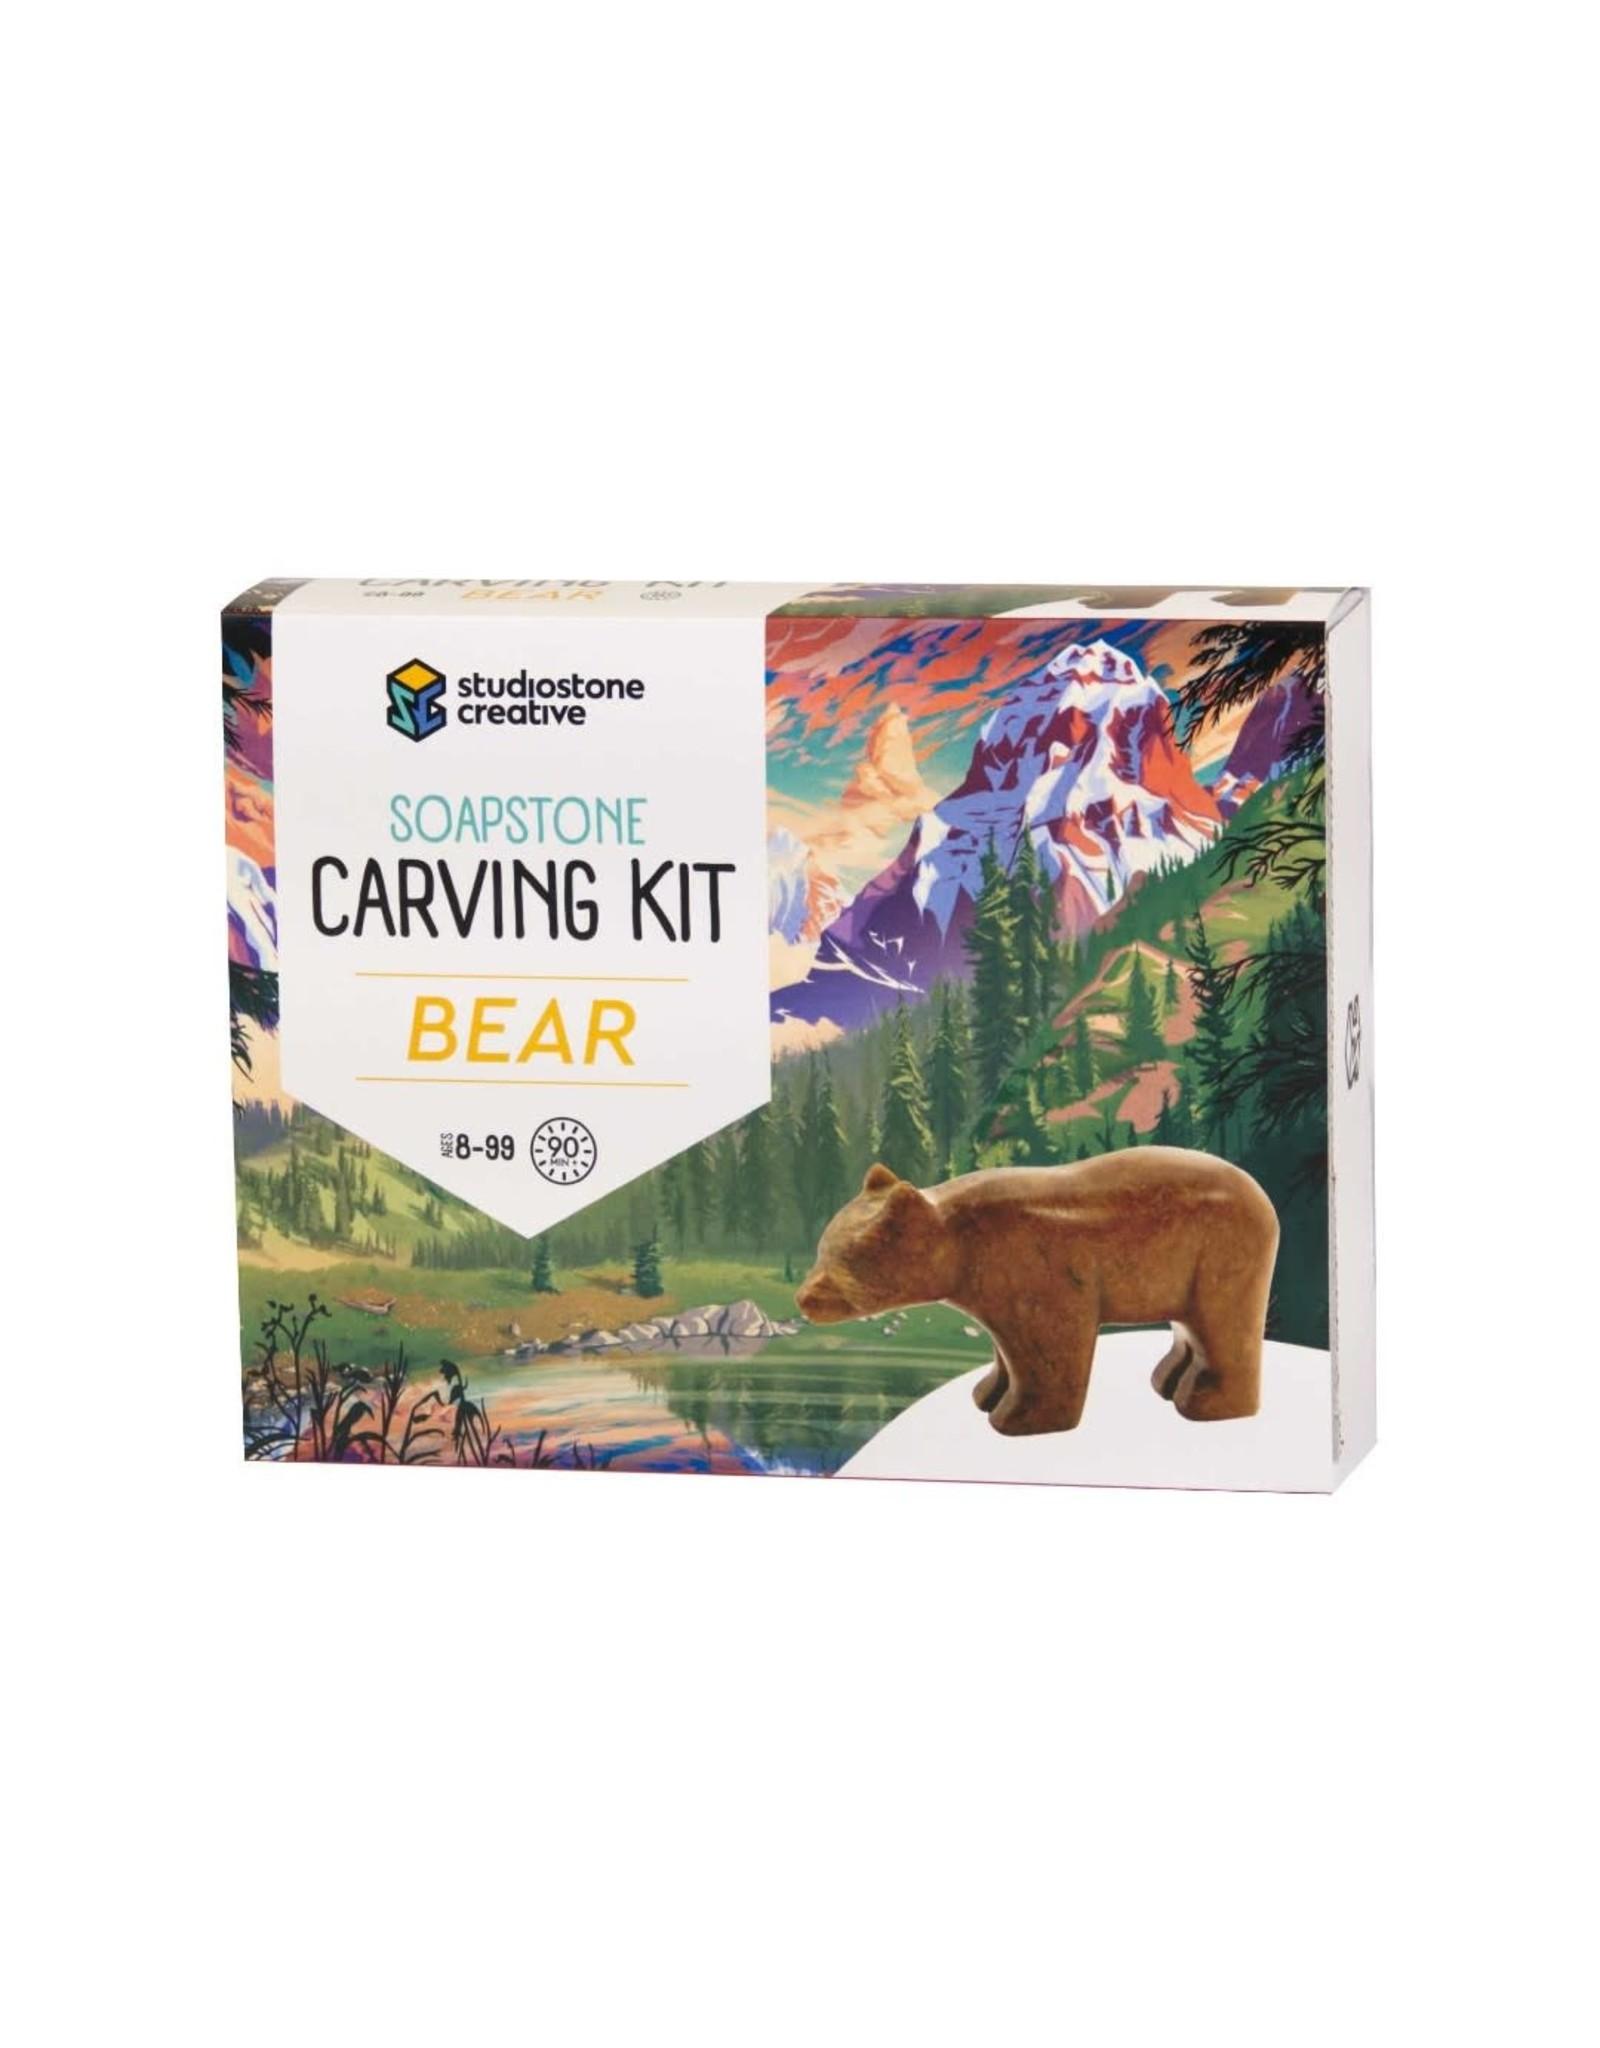 Studiostone Creative Soap stone carving kit - Bear